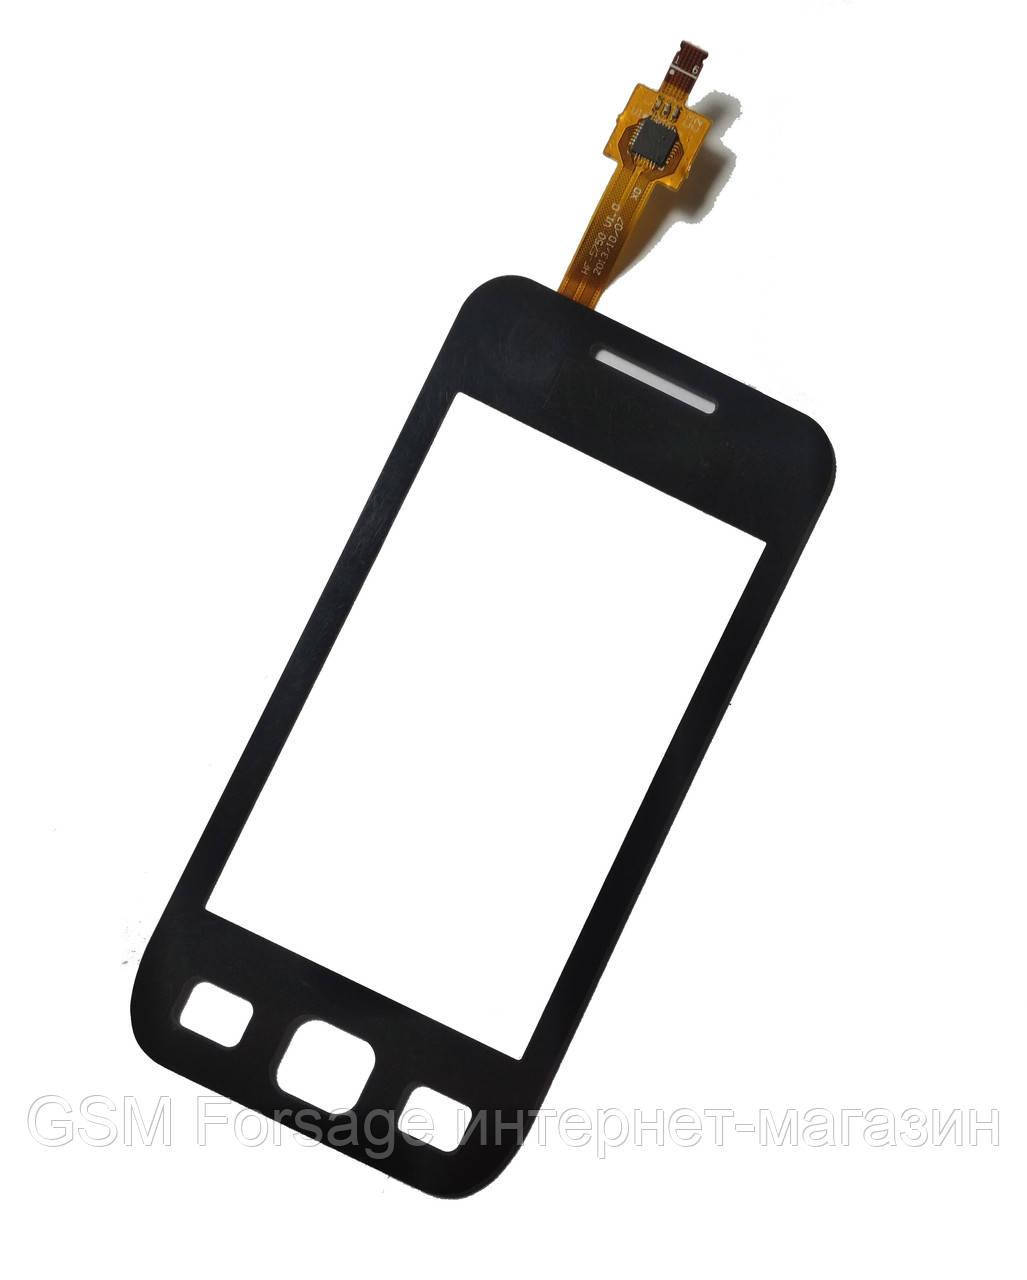 Тачскрин Samsung S5350 Shark